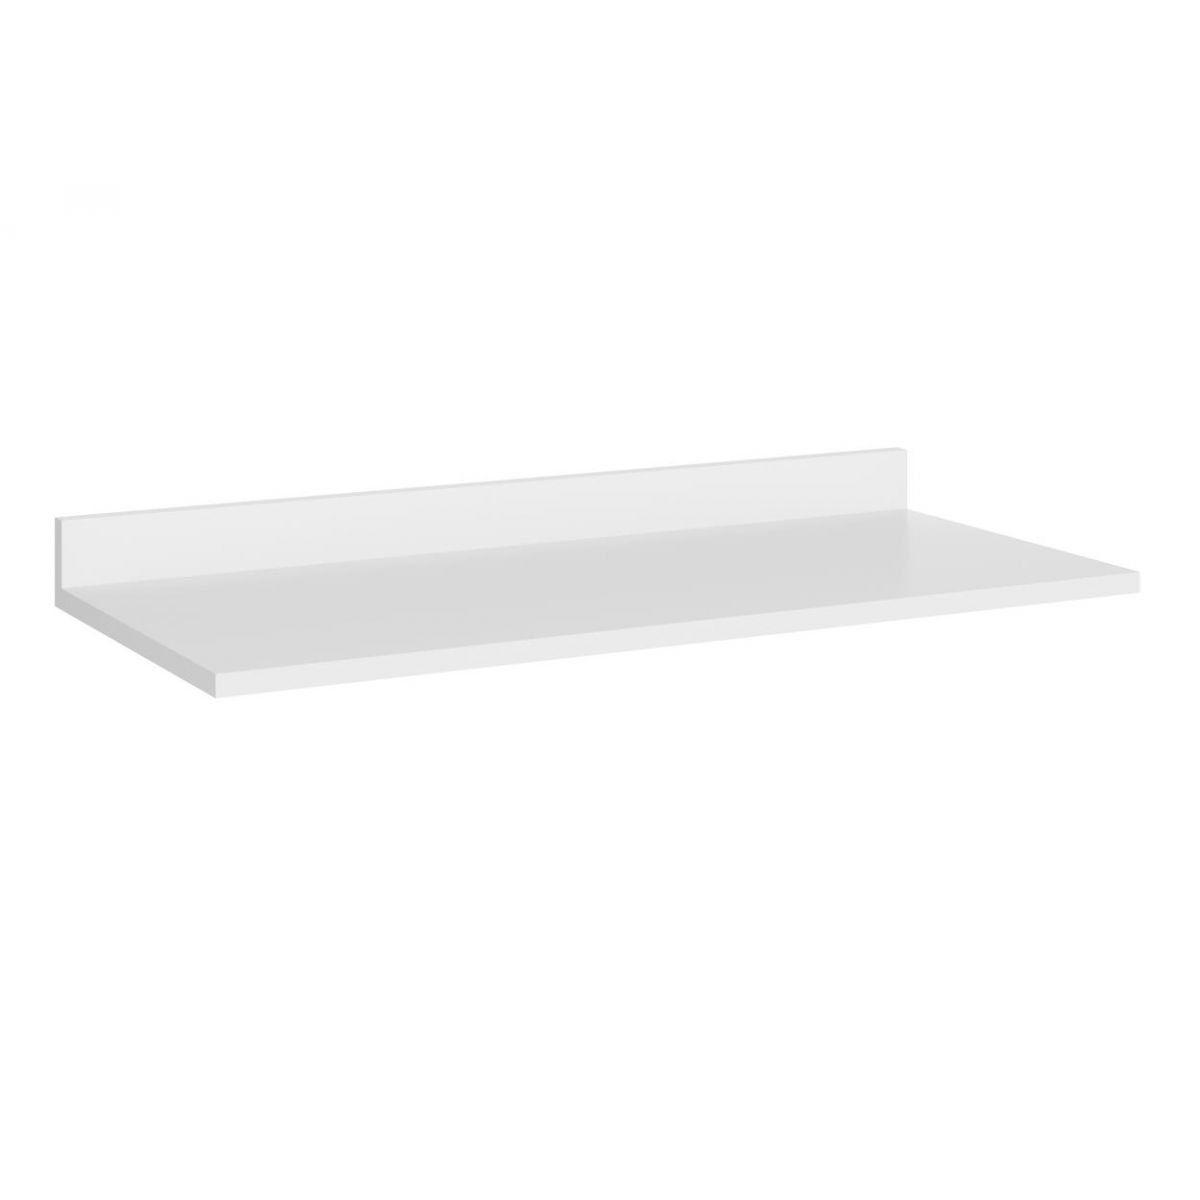 Tampo para Balcão 120 cm Branco Texturizado Toscana - Multimóveis